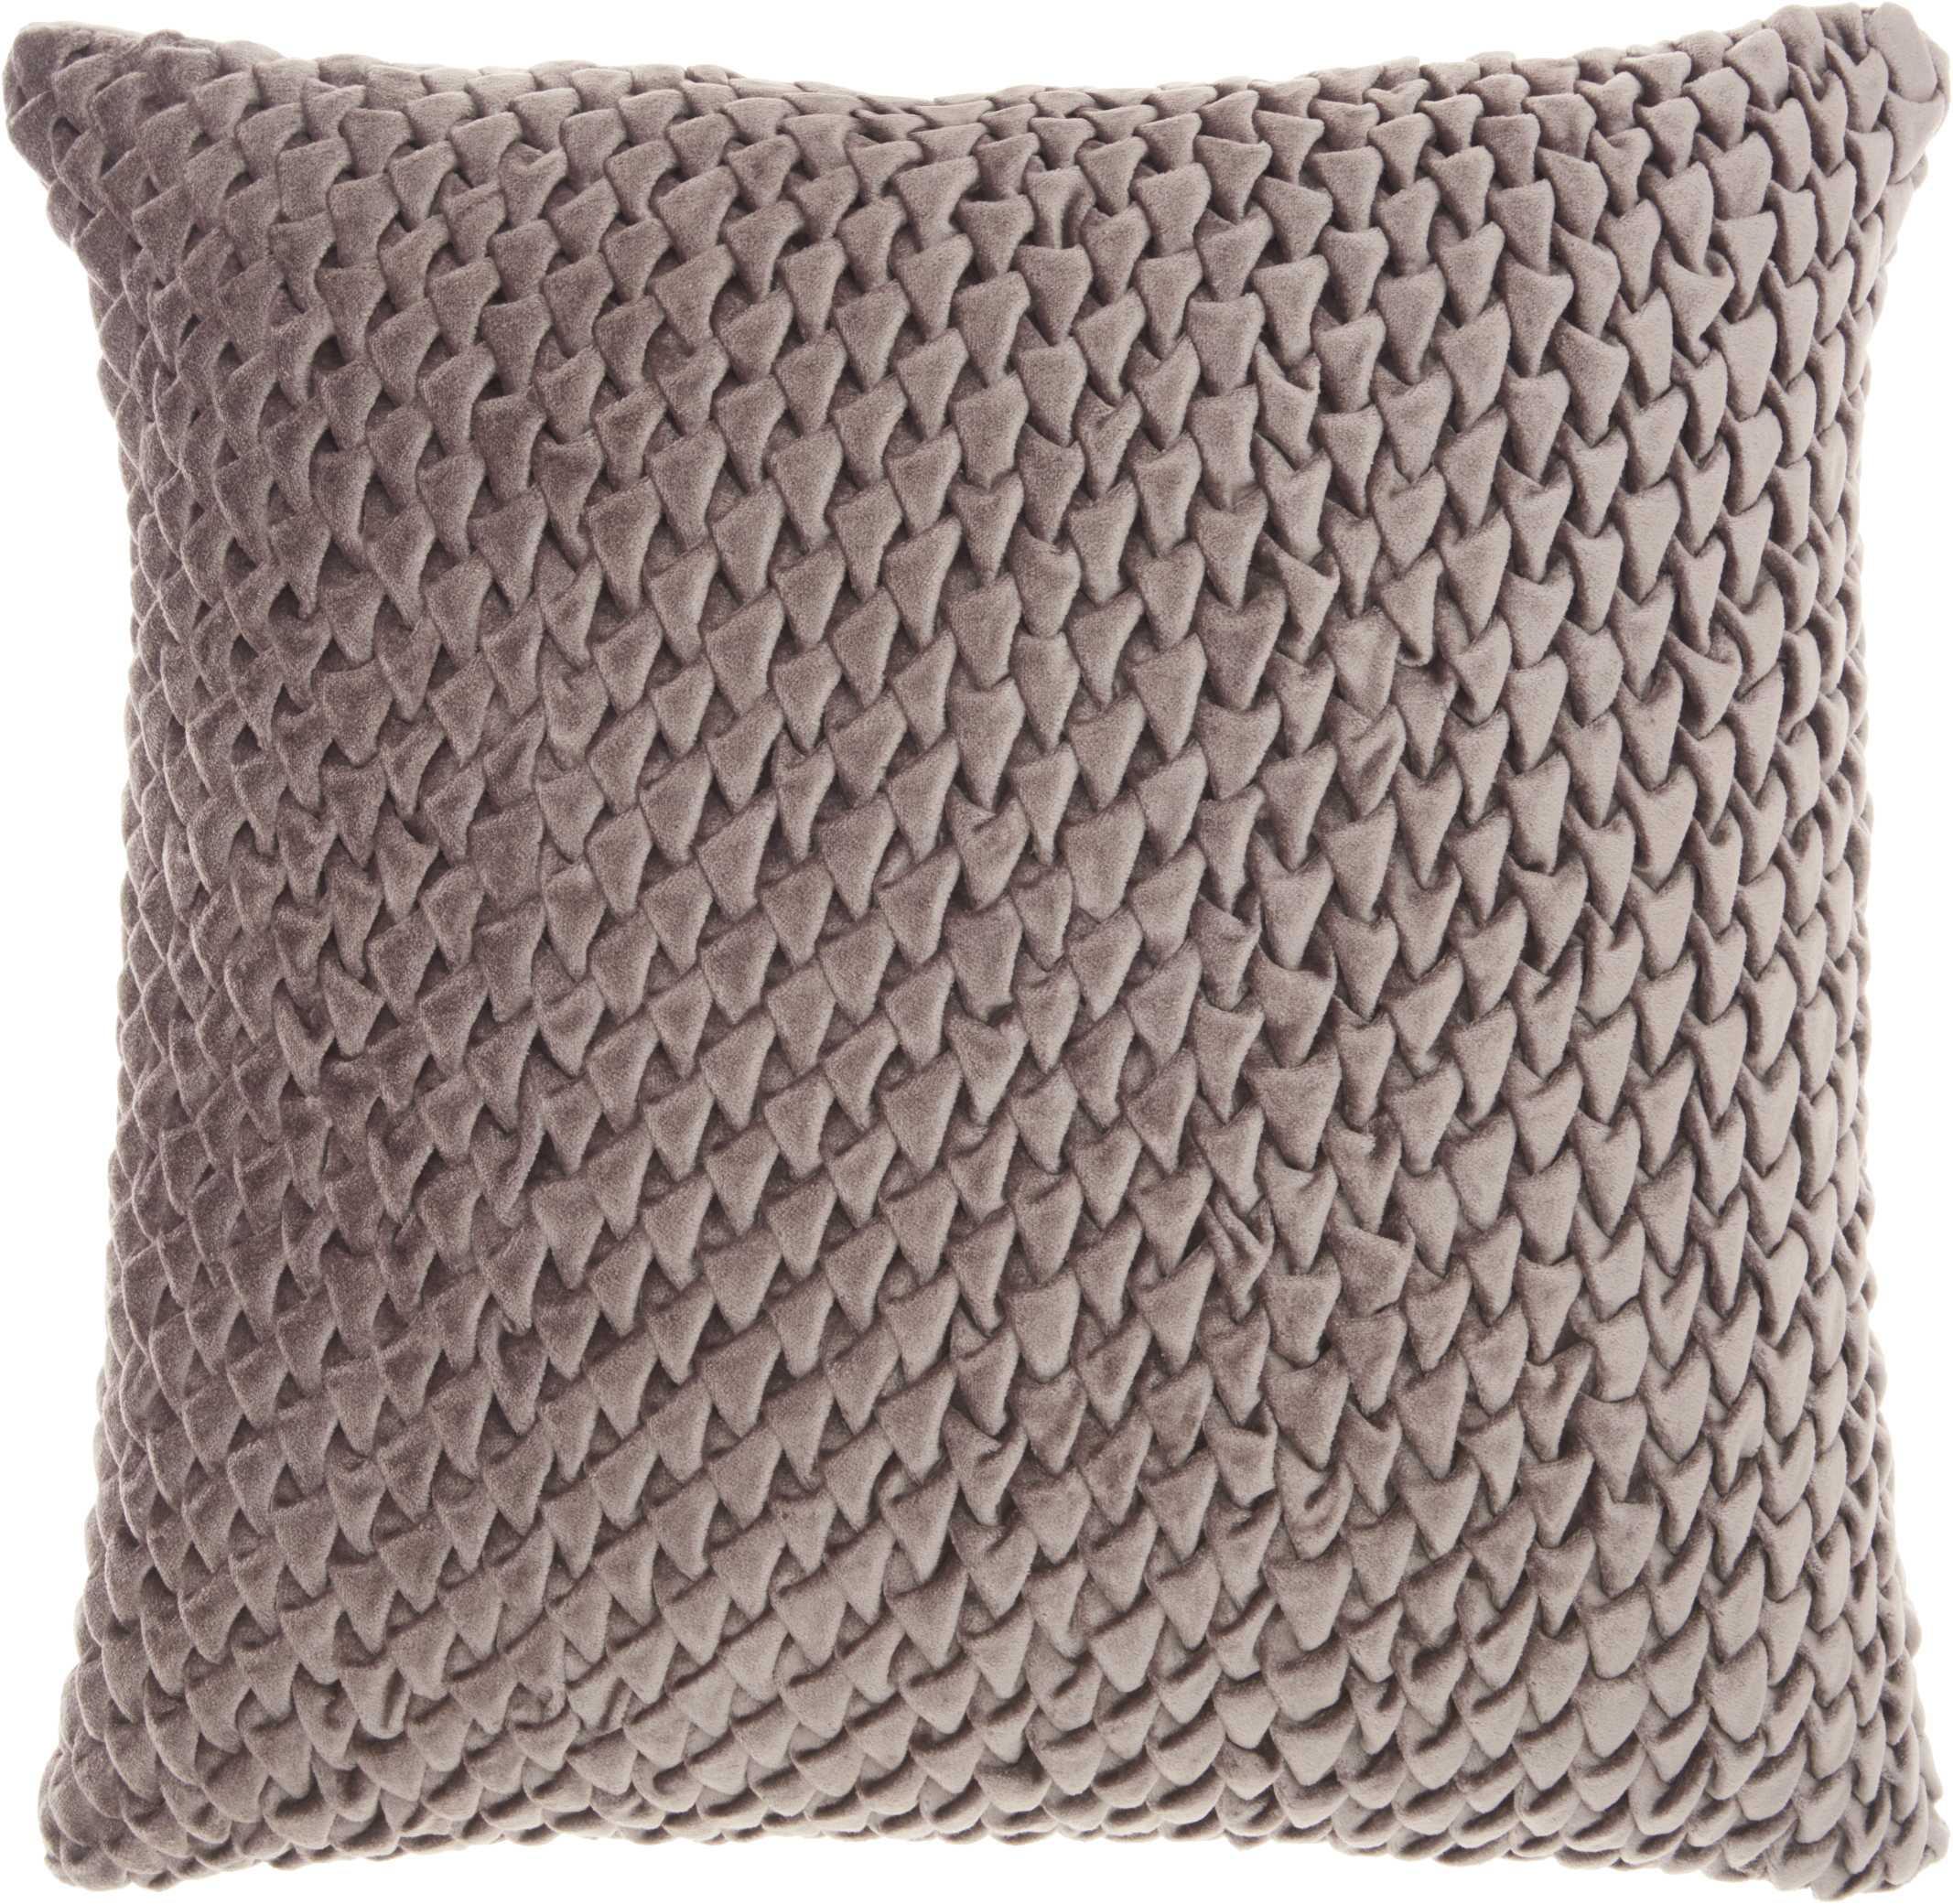 "Nourison Life Styles Pleated Velvet Decorative Throw Pillow, 18"" x 18"", Beige"